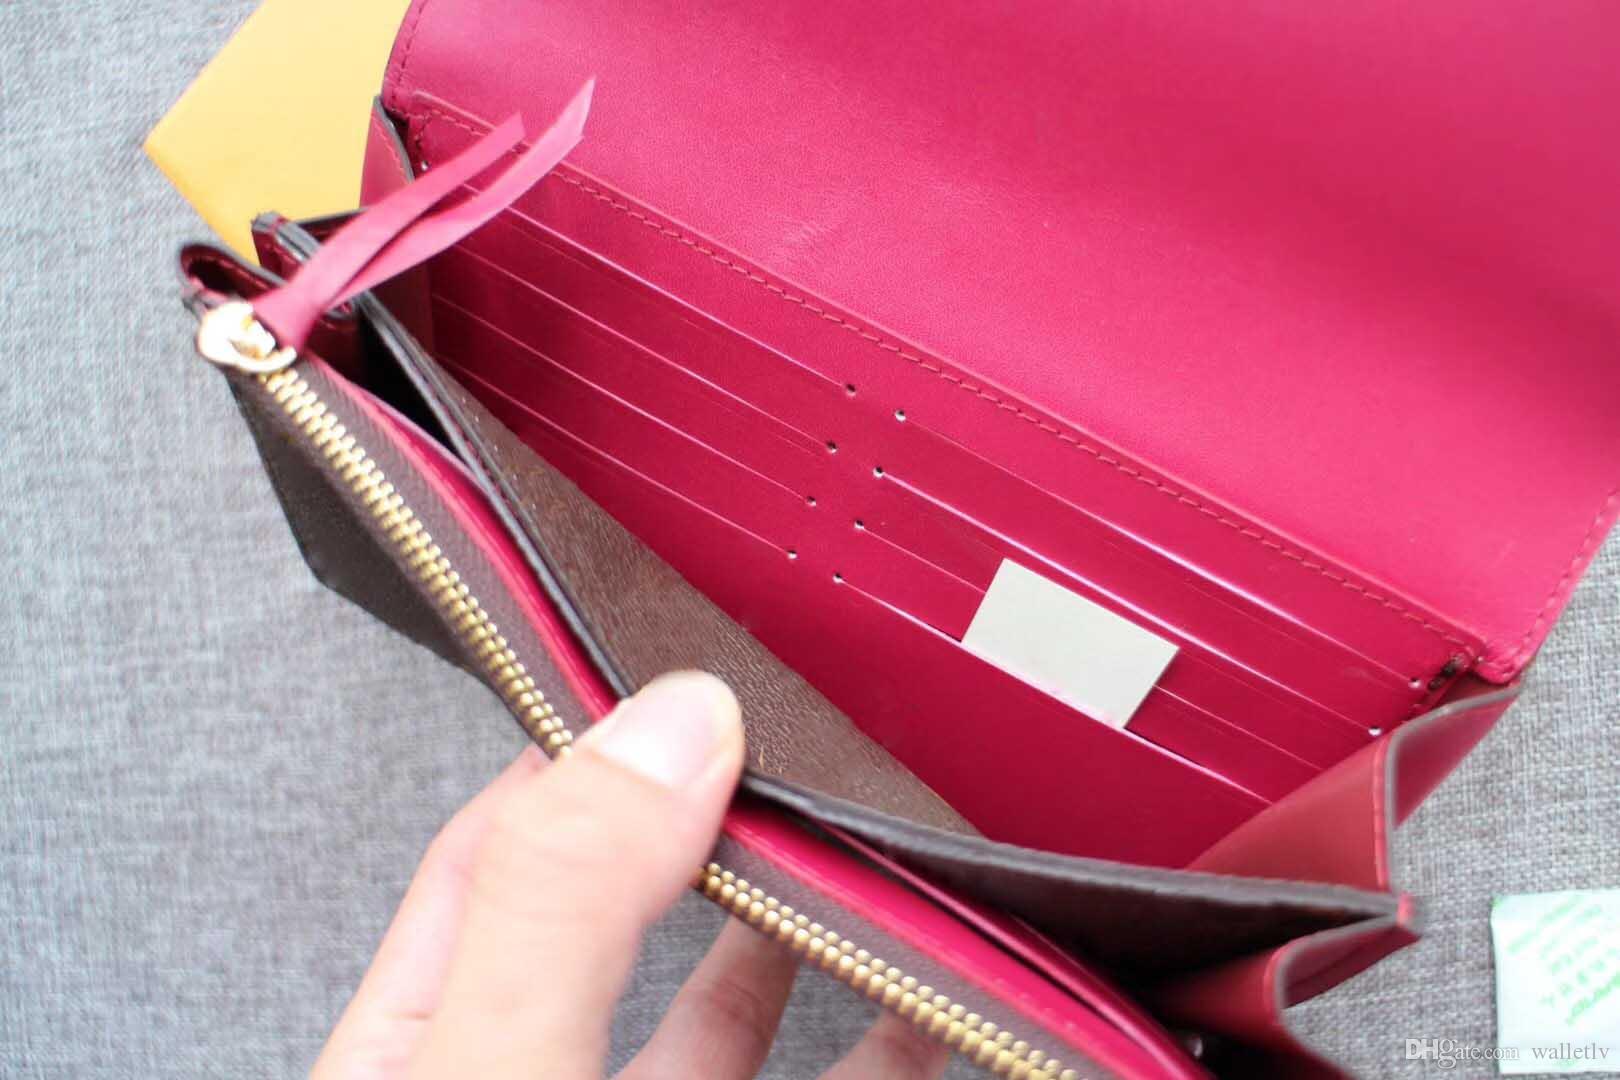 f21a8c344110 Designer Handbags Wallet handbag women bags Crossbody bag Fashion leather  Shoulder Bags Credit card bag Zero wallet.